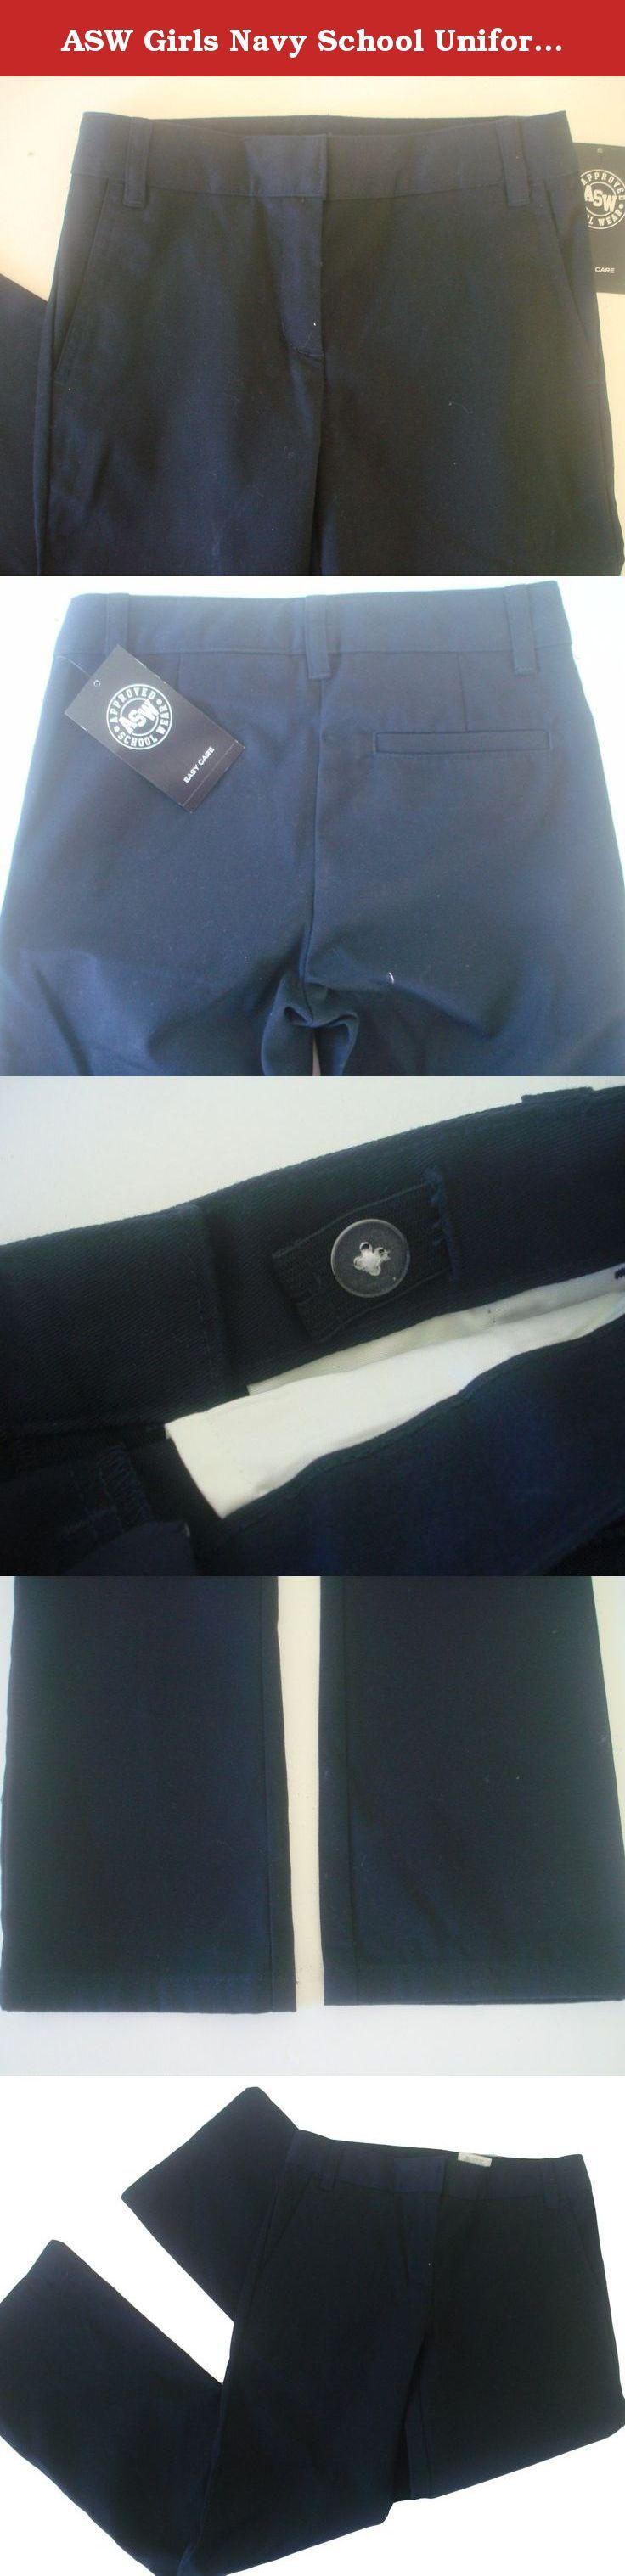 ASW Girls Navy School Uniform Pants Size 14.